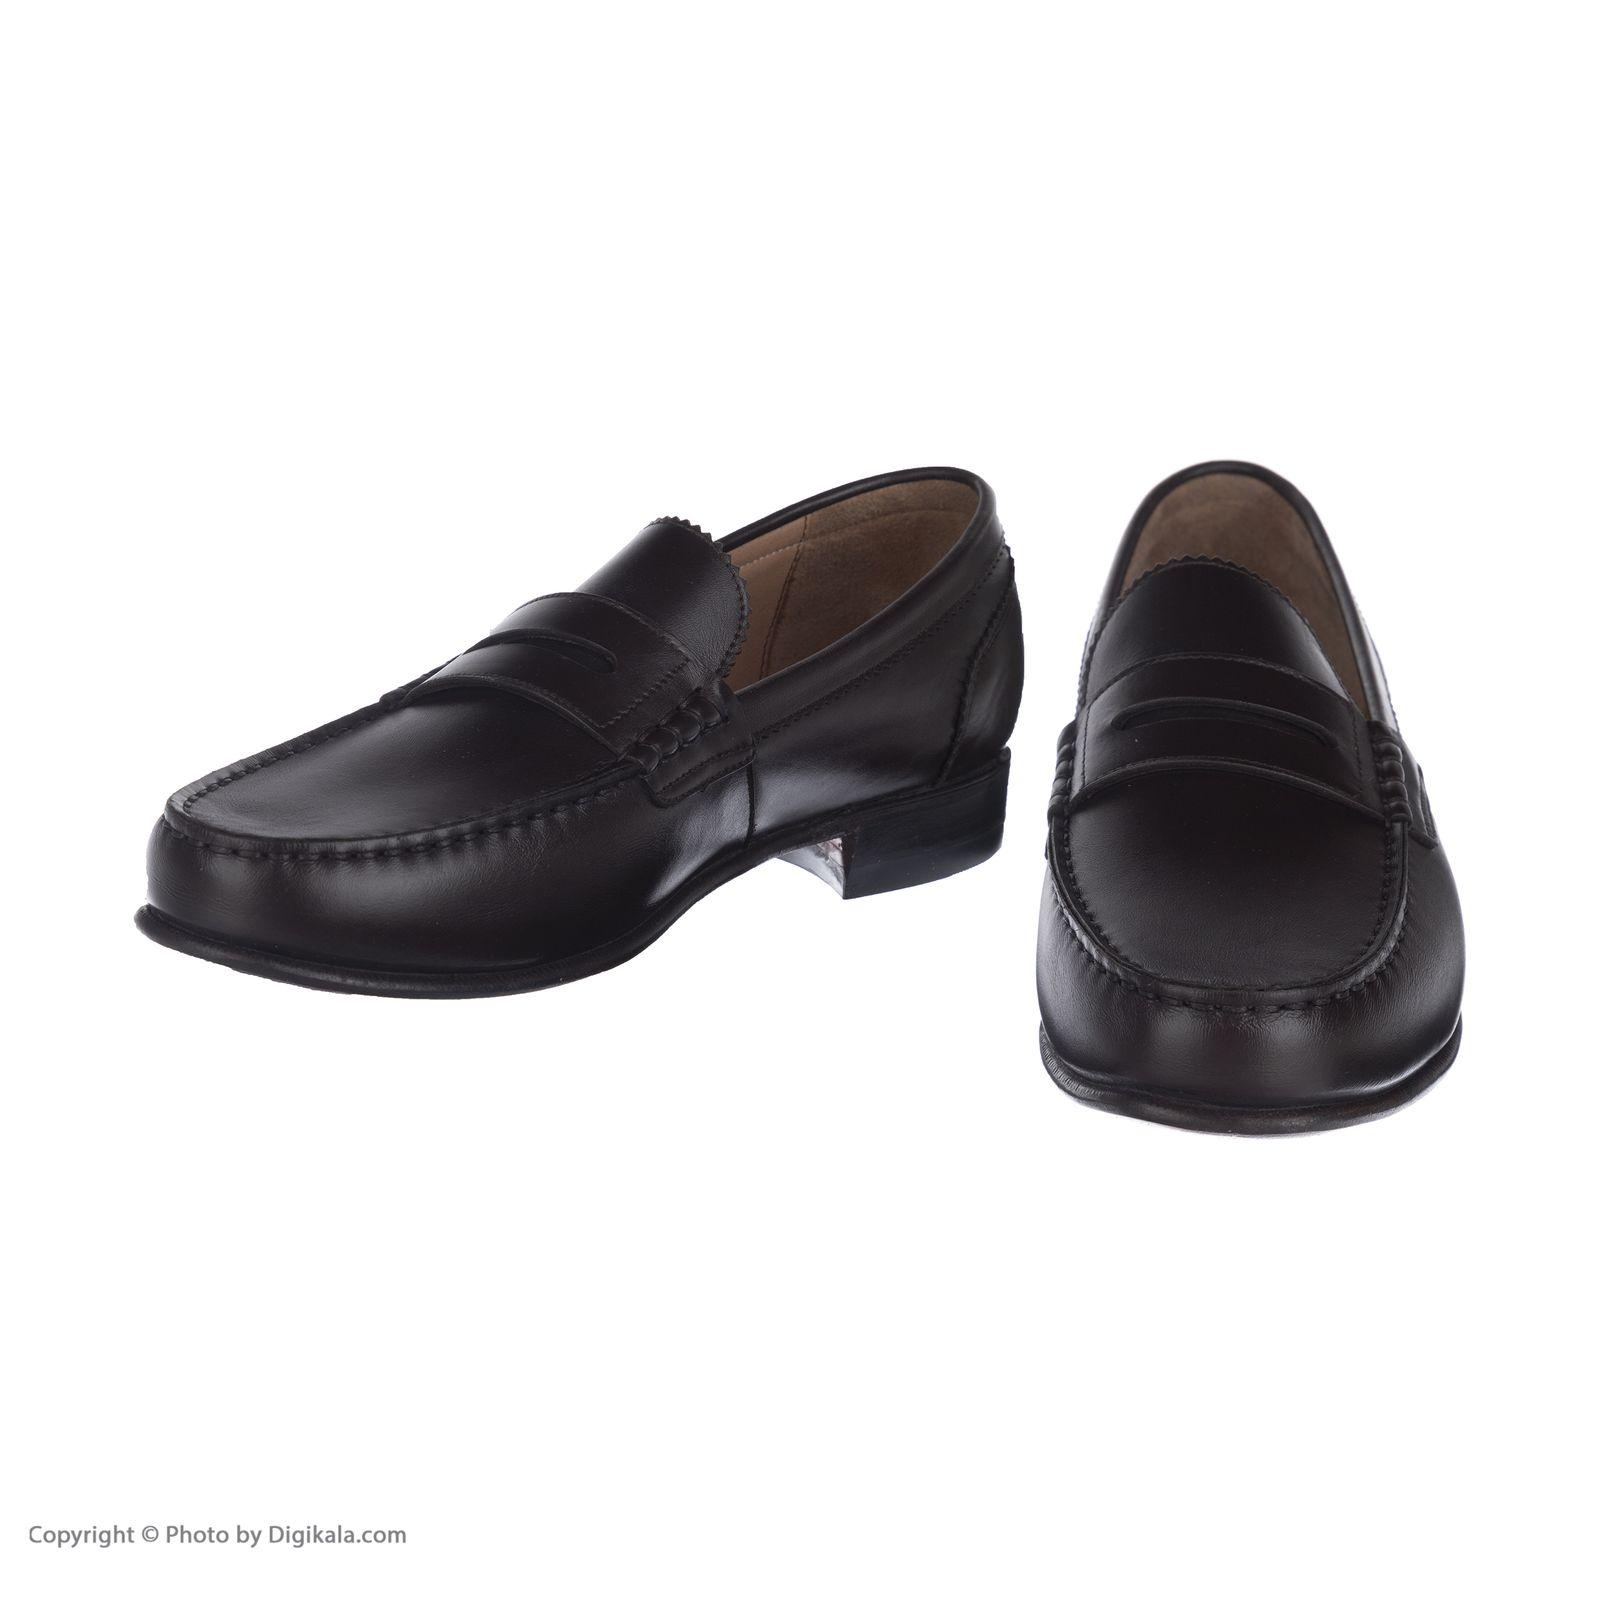 کفش مردانه نظری کد 436 -  - 4